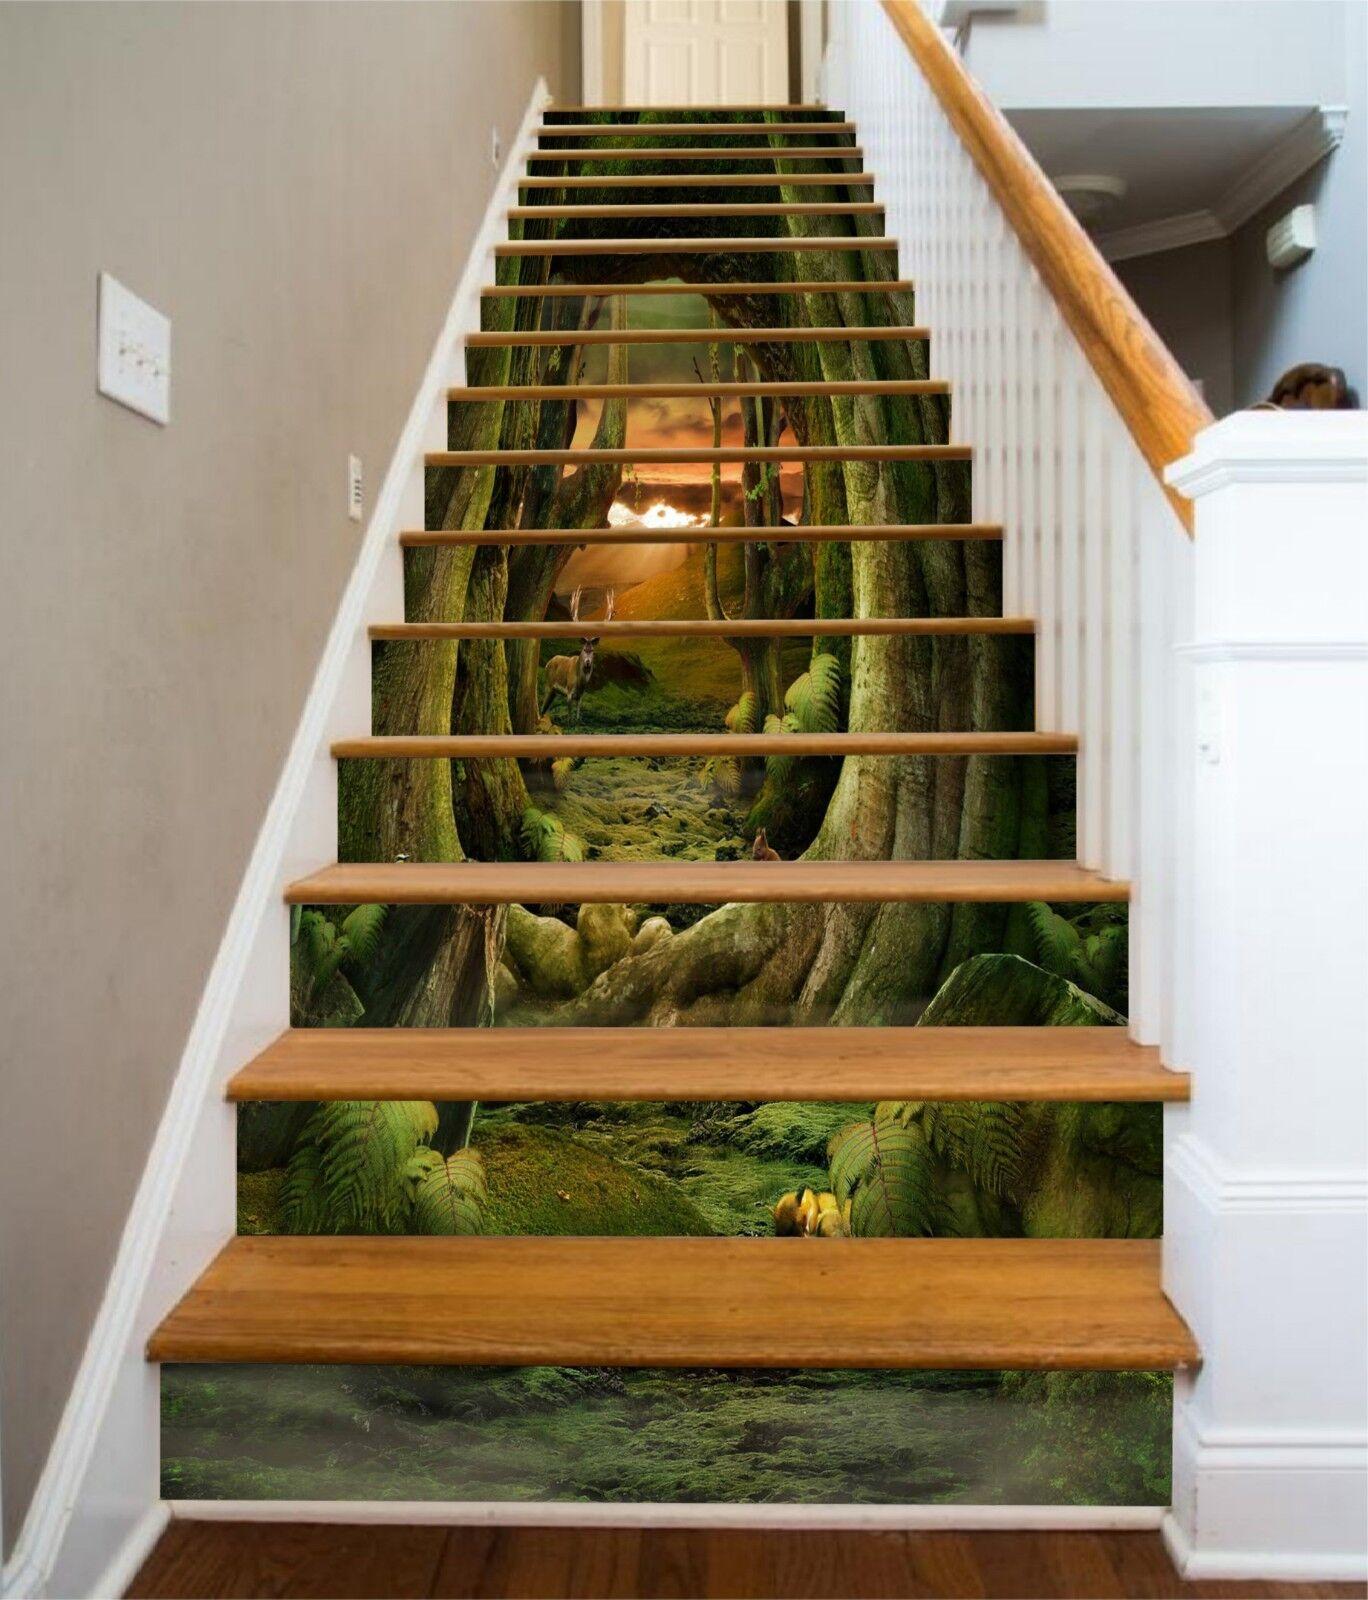 3D Forest Deer Stair Risers Decoration Photo Mural Vinyl Decal Wallpaper UK